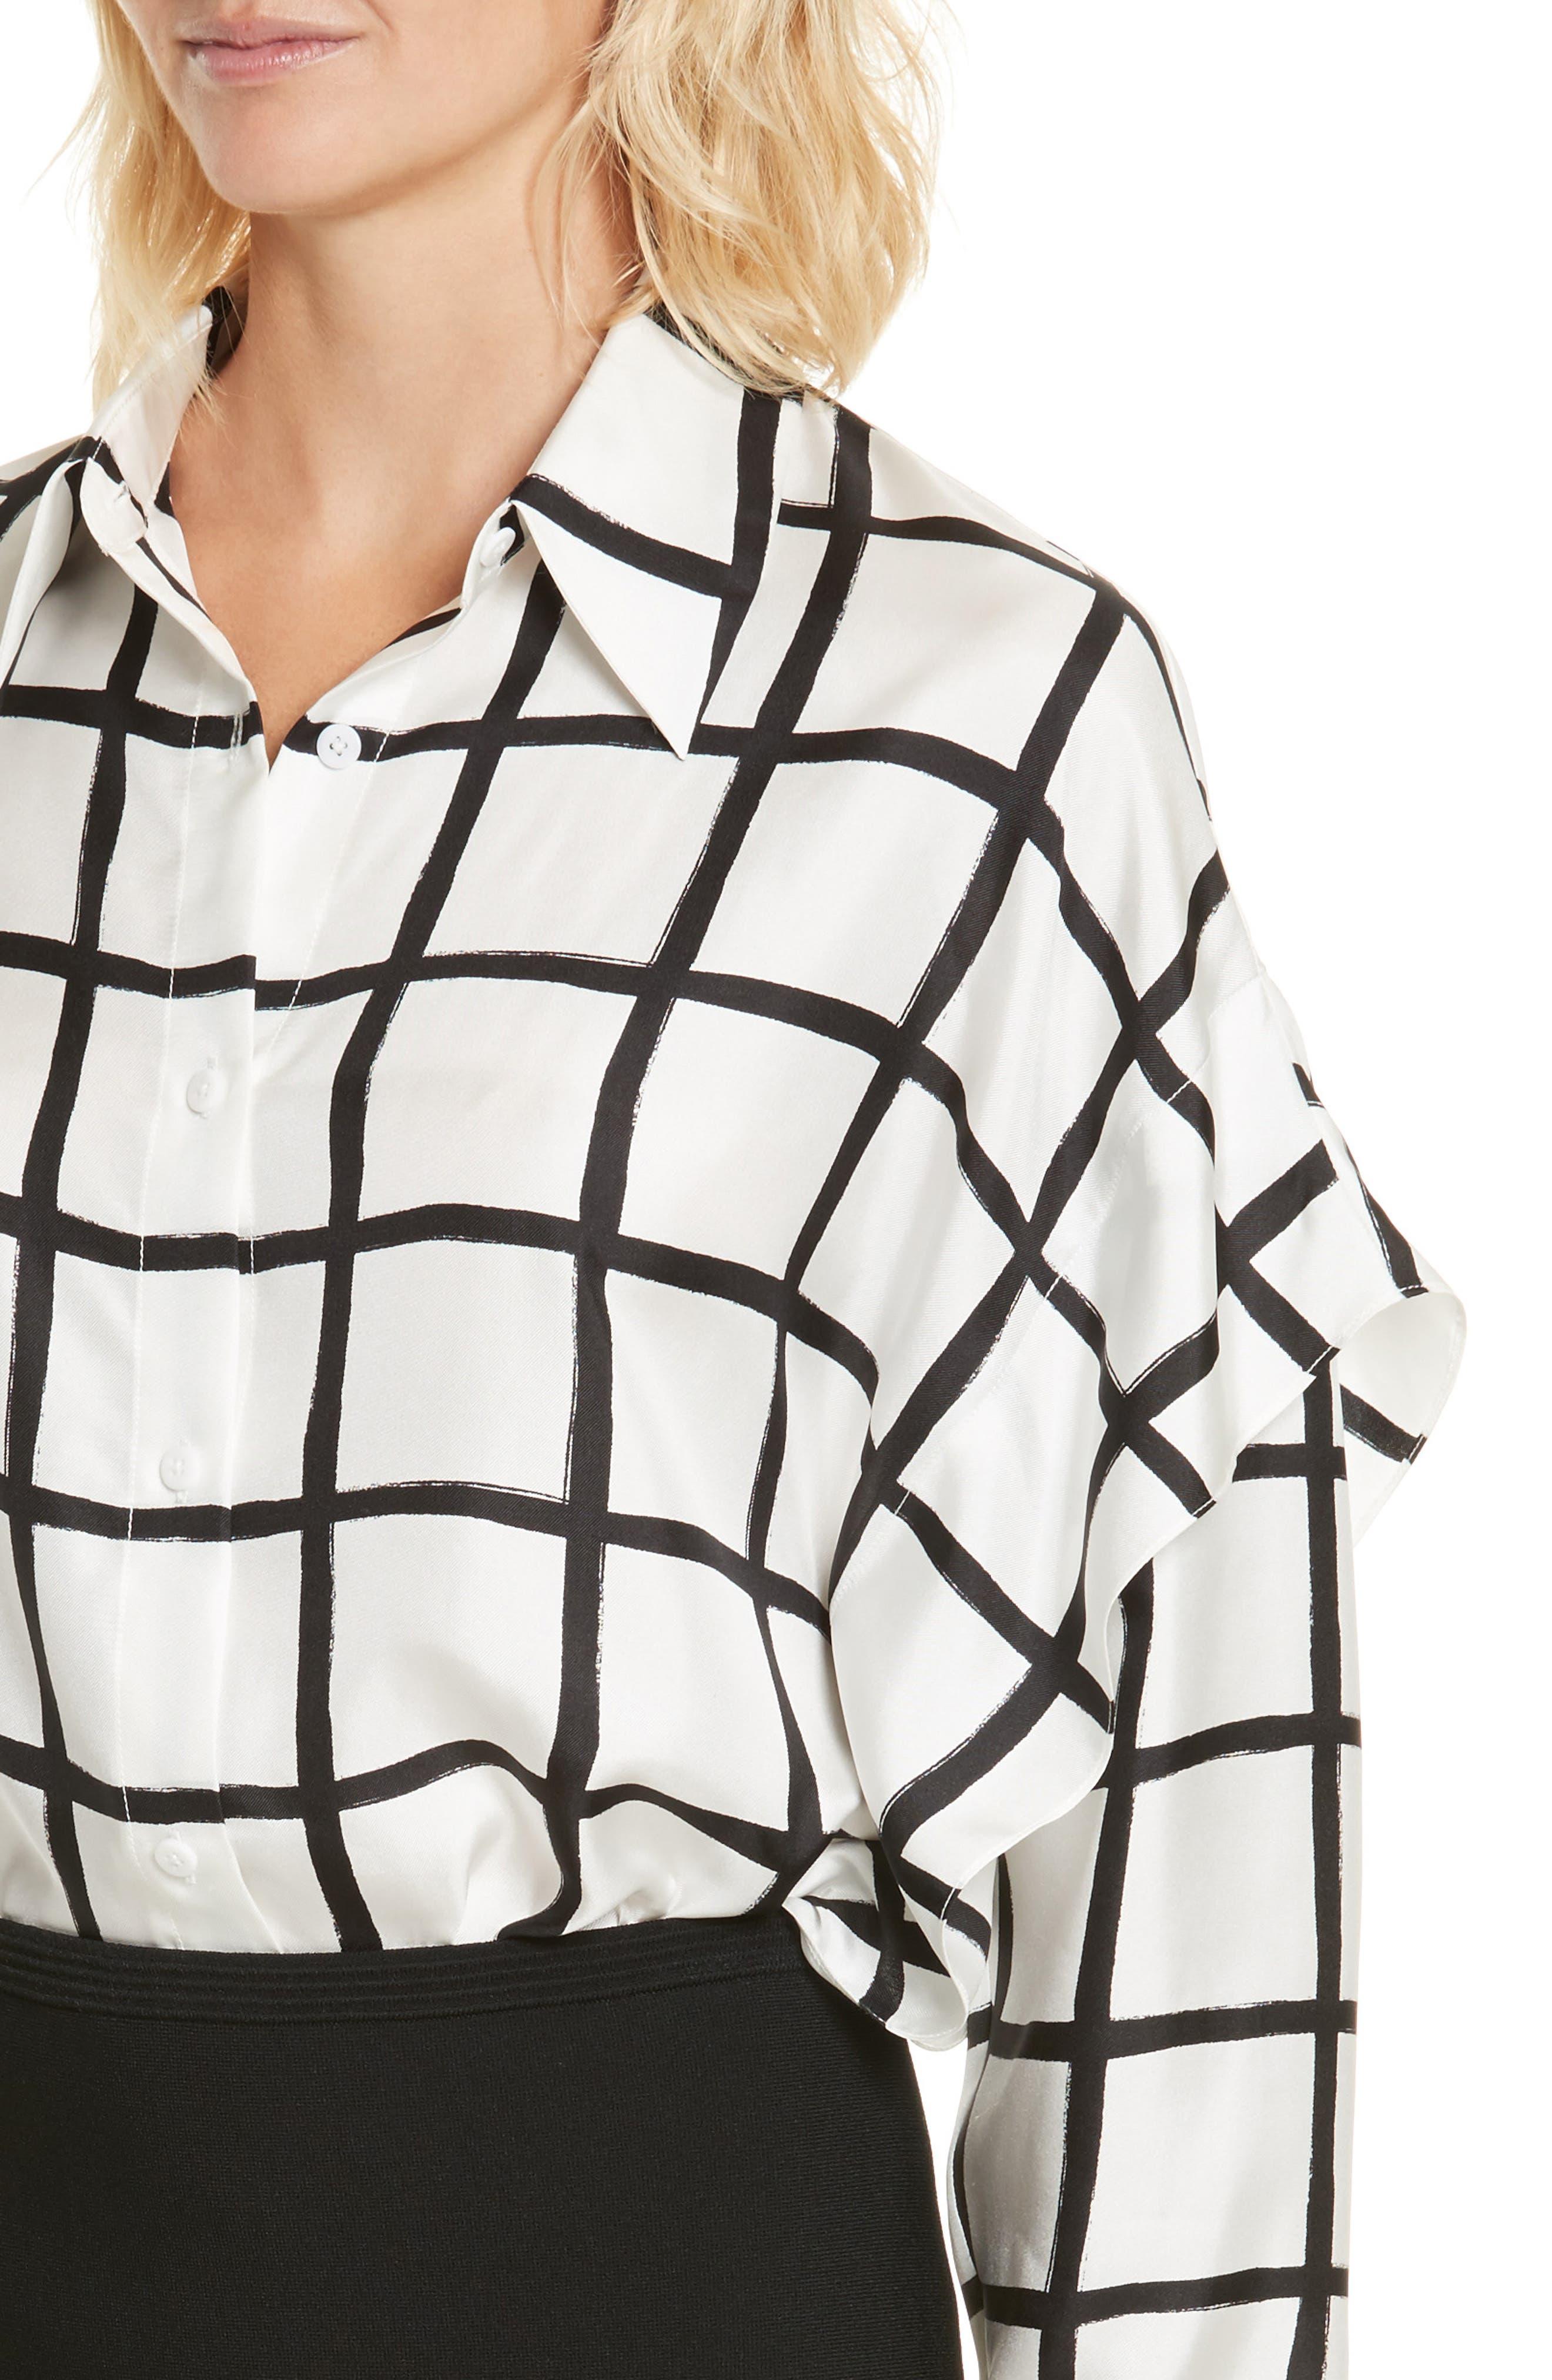 Diane von Furstenberg Windowpane Plaid Button Down Silk Shirt,                             Alternate thumbnail 4, color,                             178